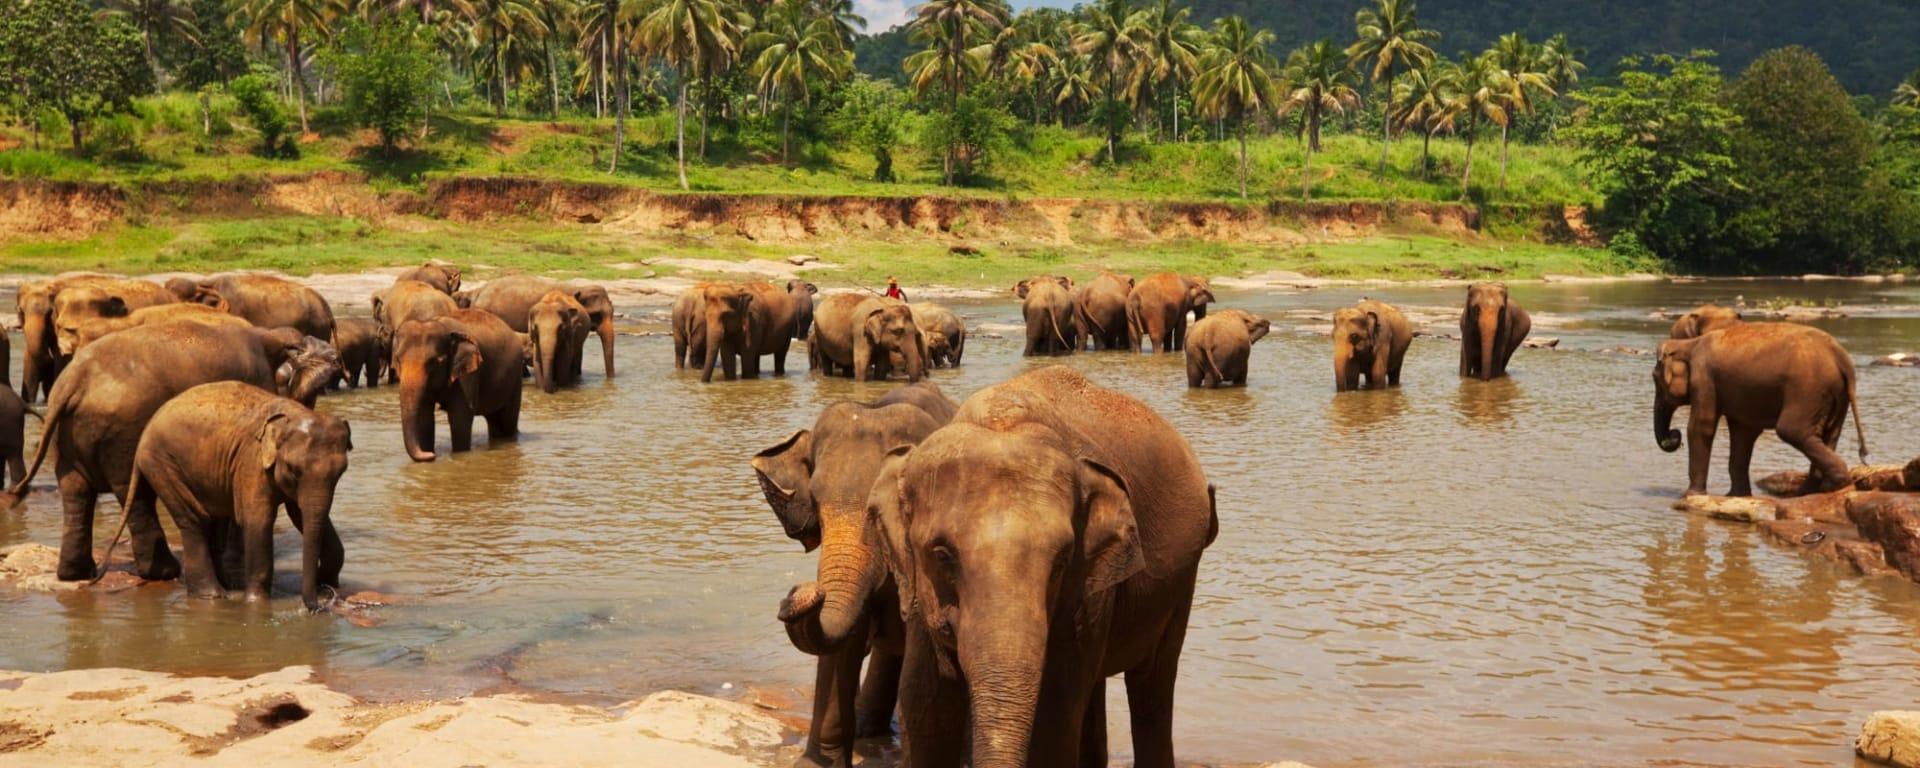 Naturpfade Sri Lankas ab Colombo: Sri Lanka Elefanten